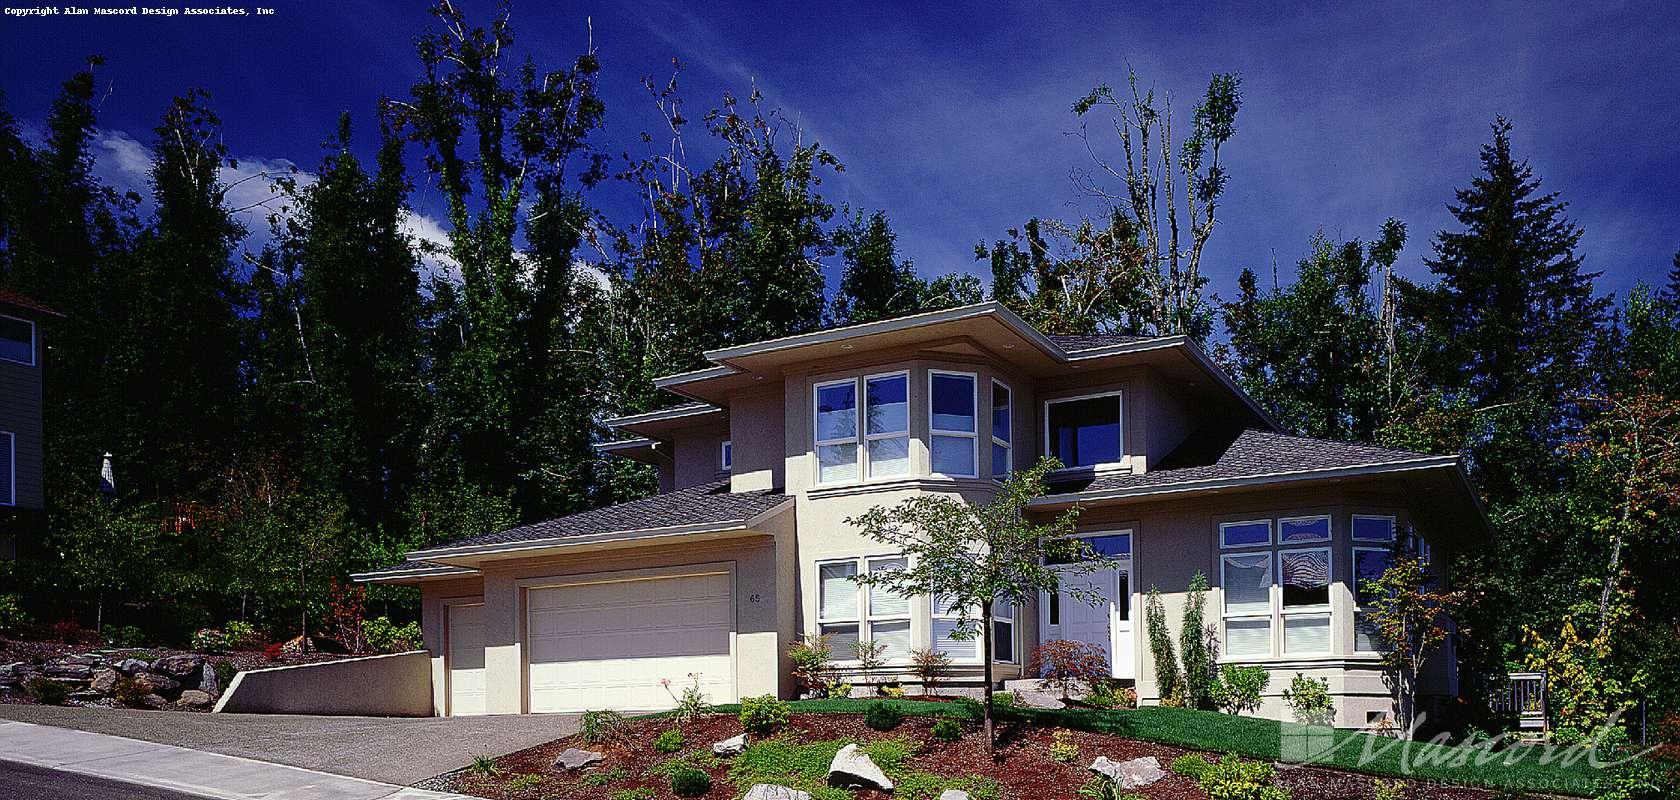 Mascord House Plan 2206C: The Sterlington